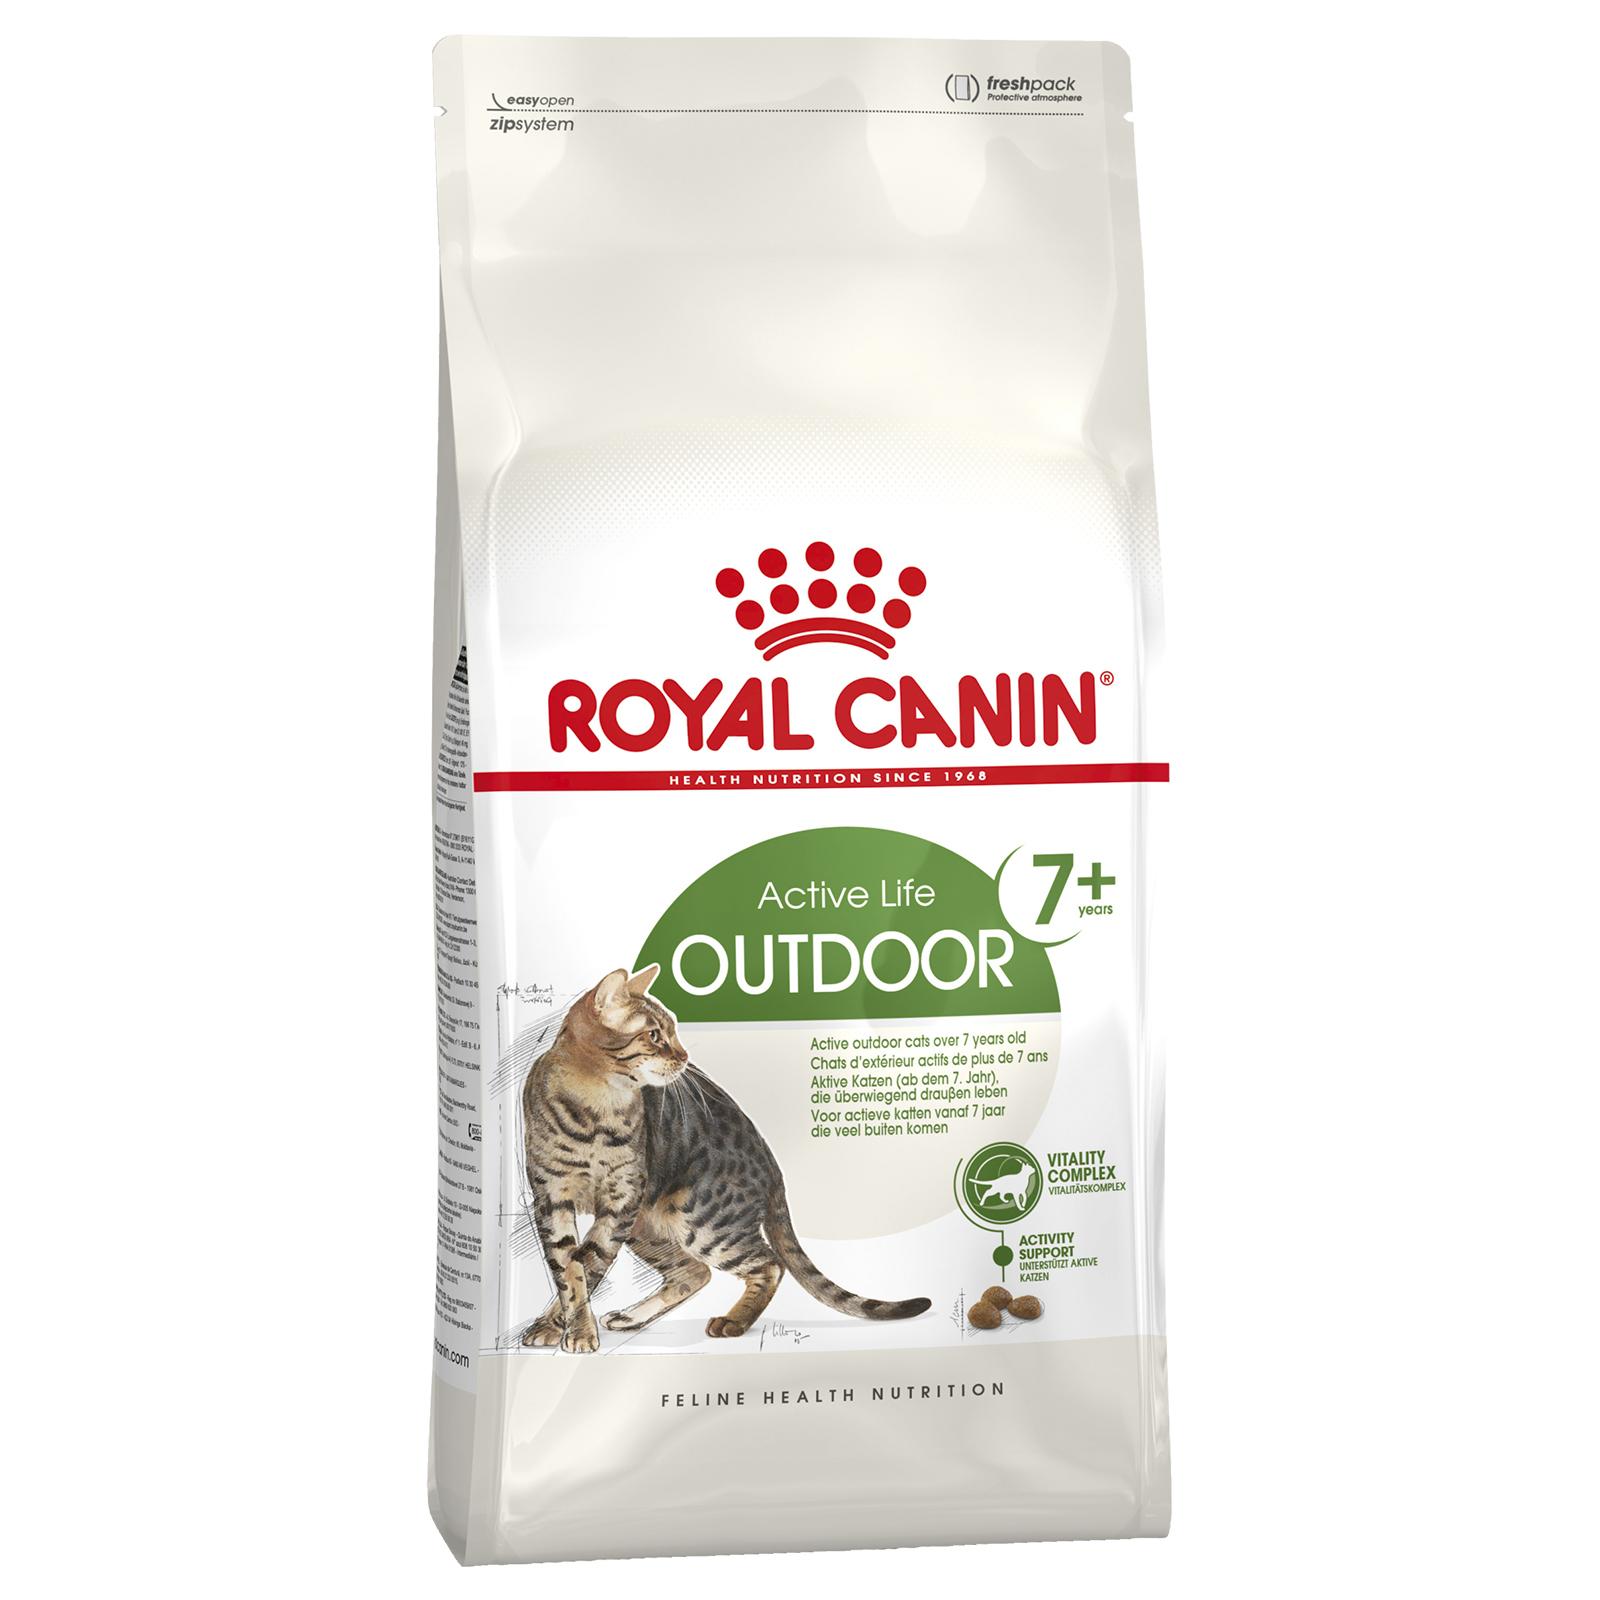 Royal Canin Cat Food Kg